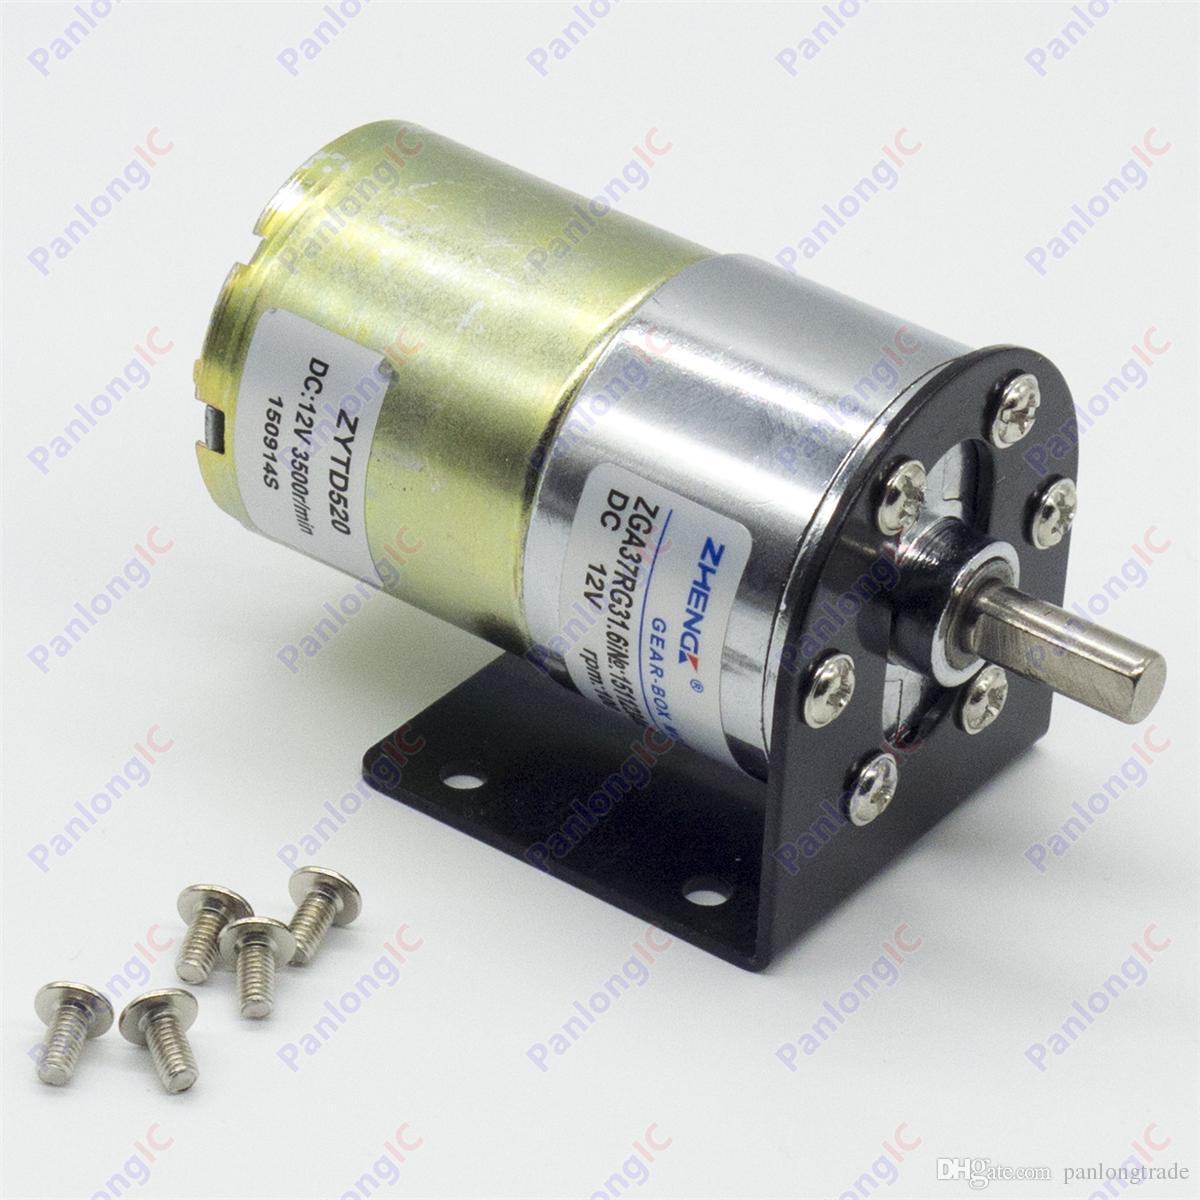 Dc 12 Volt Reversible Motor Wiring Diagram Library Zga37rg 12v 100 Rpm Gear Box 1 345 High Torque 3500r Min